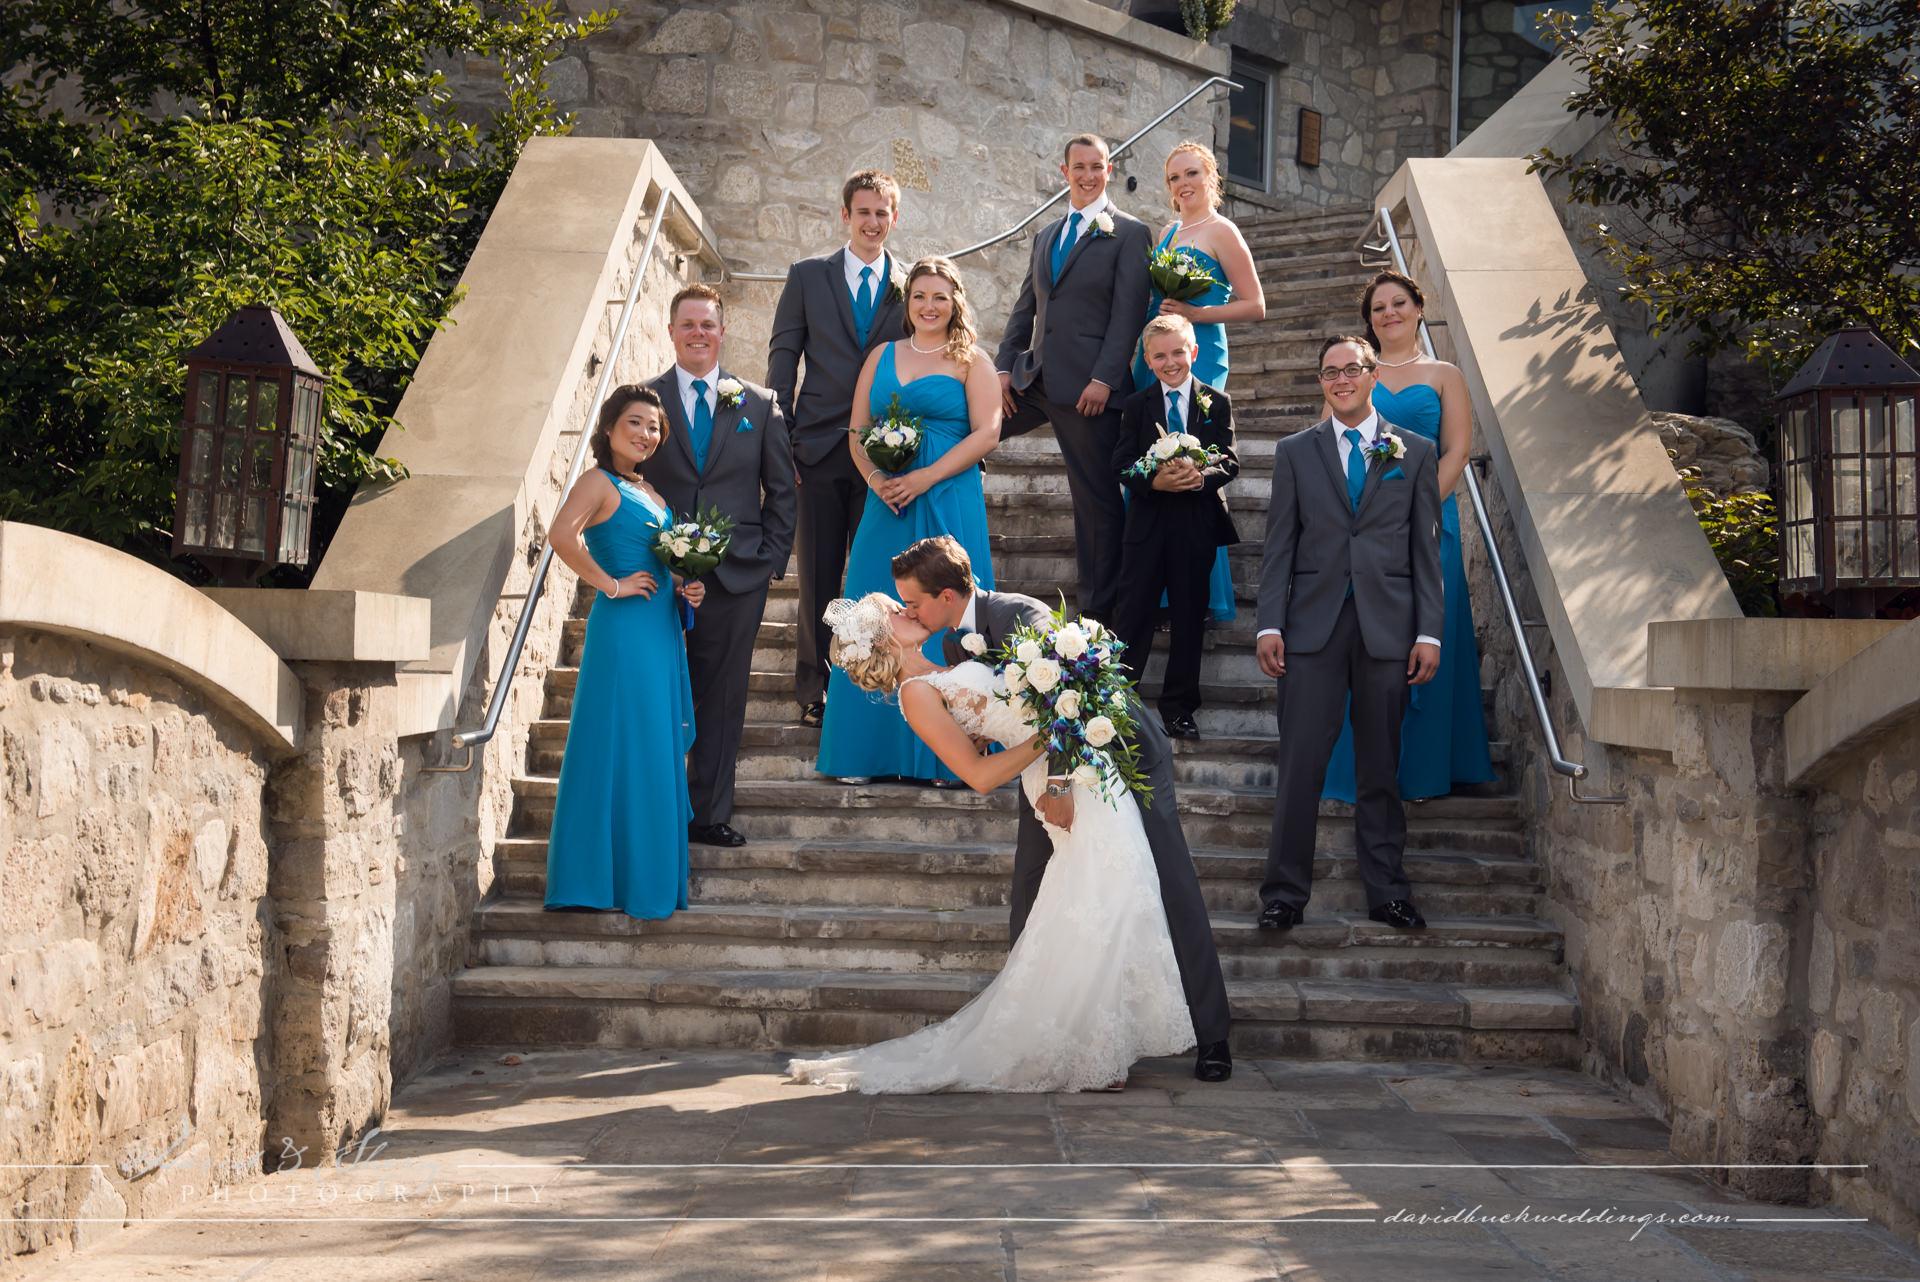 cambridge-mill-wedding-david-sherry-photography-23